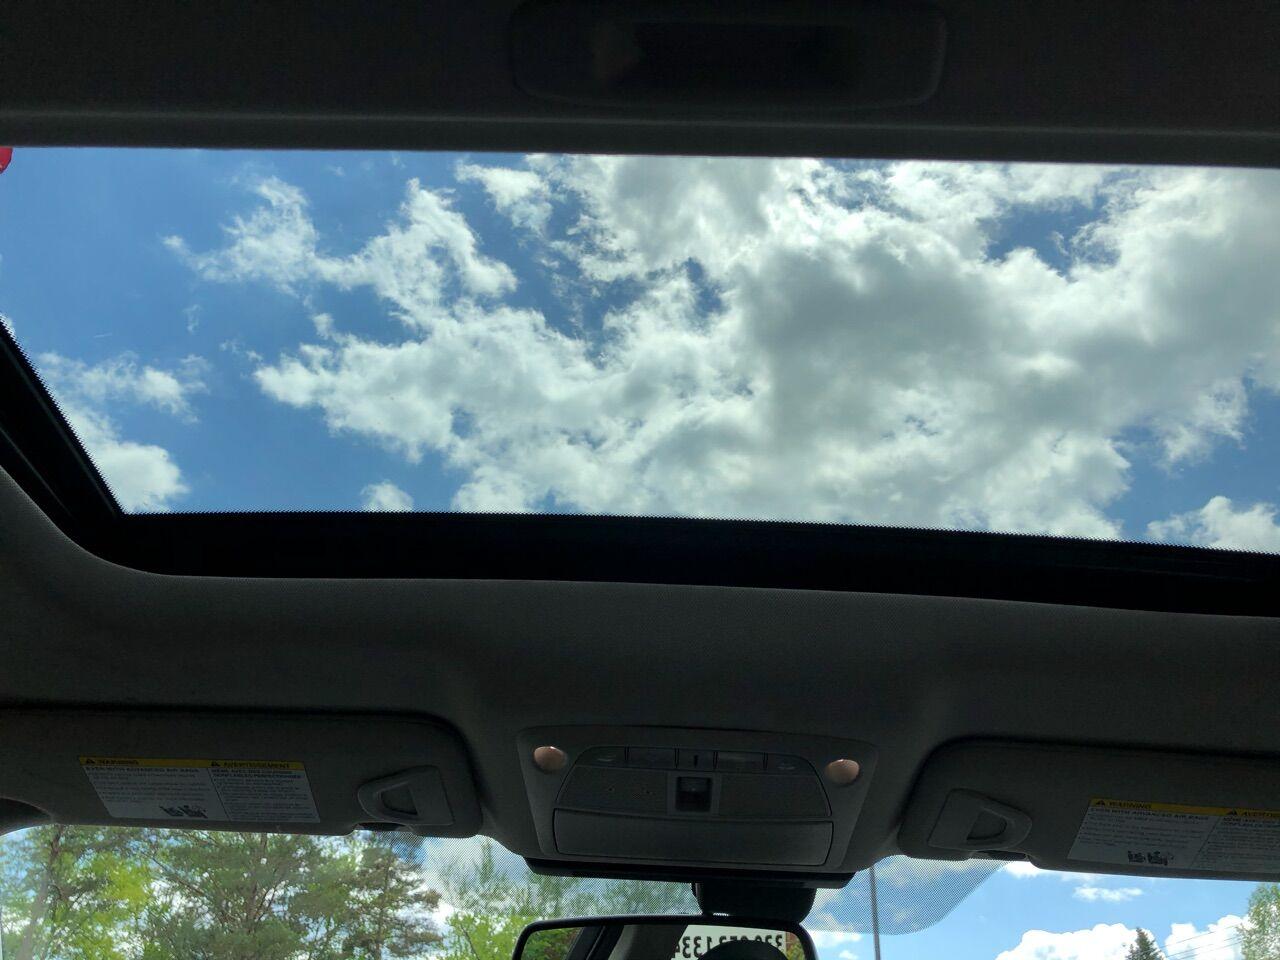 2017 INFINITI Q50 4dr Car